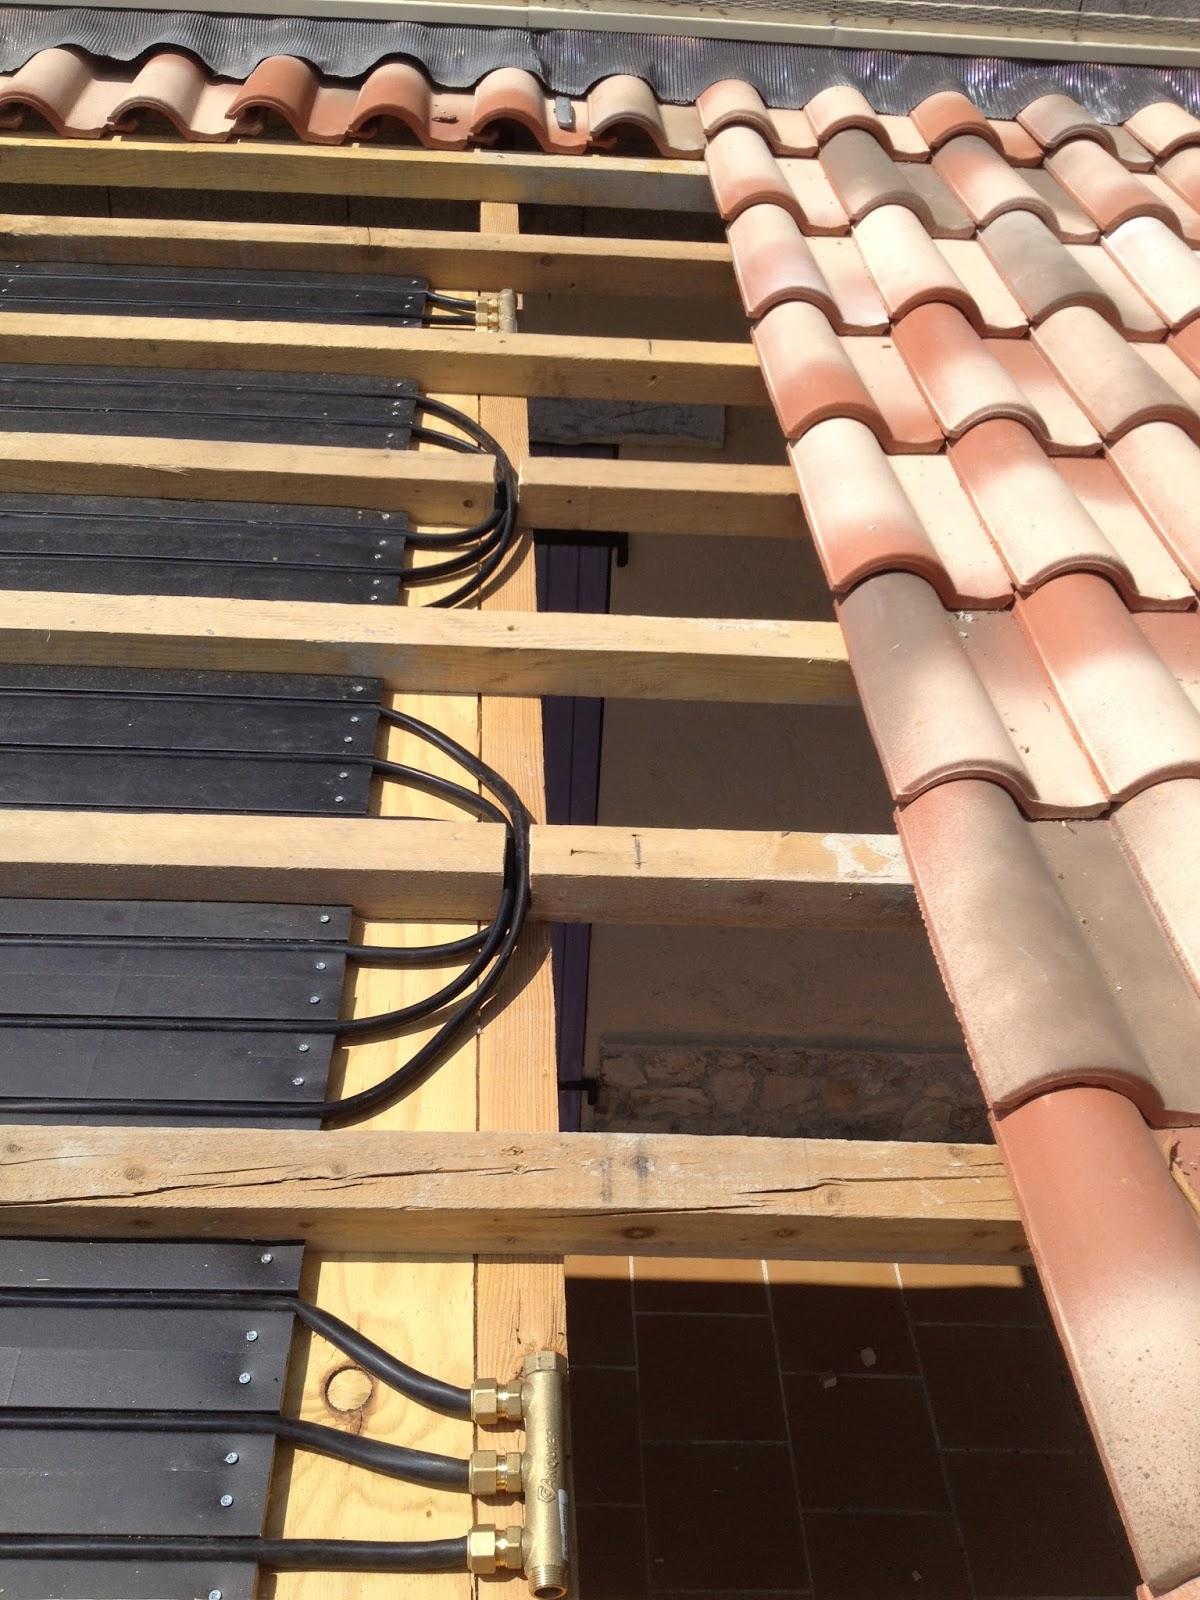 Plancher chauffant sec mince mur chauffant plafond for Chauffage piscine toiture